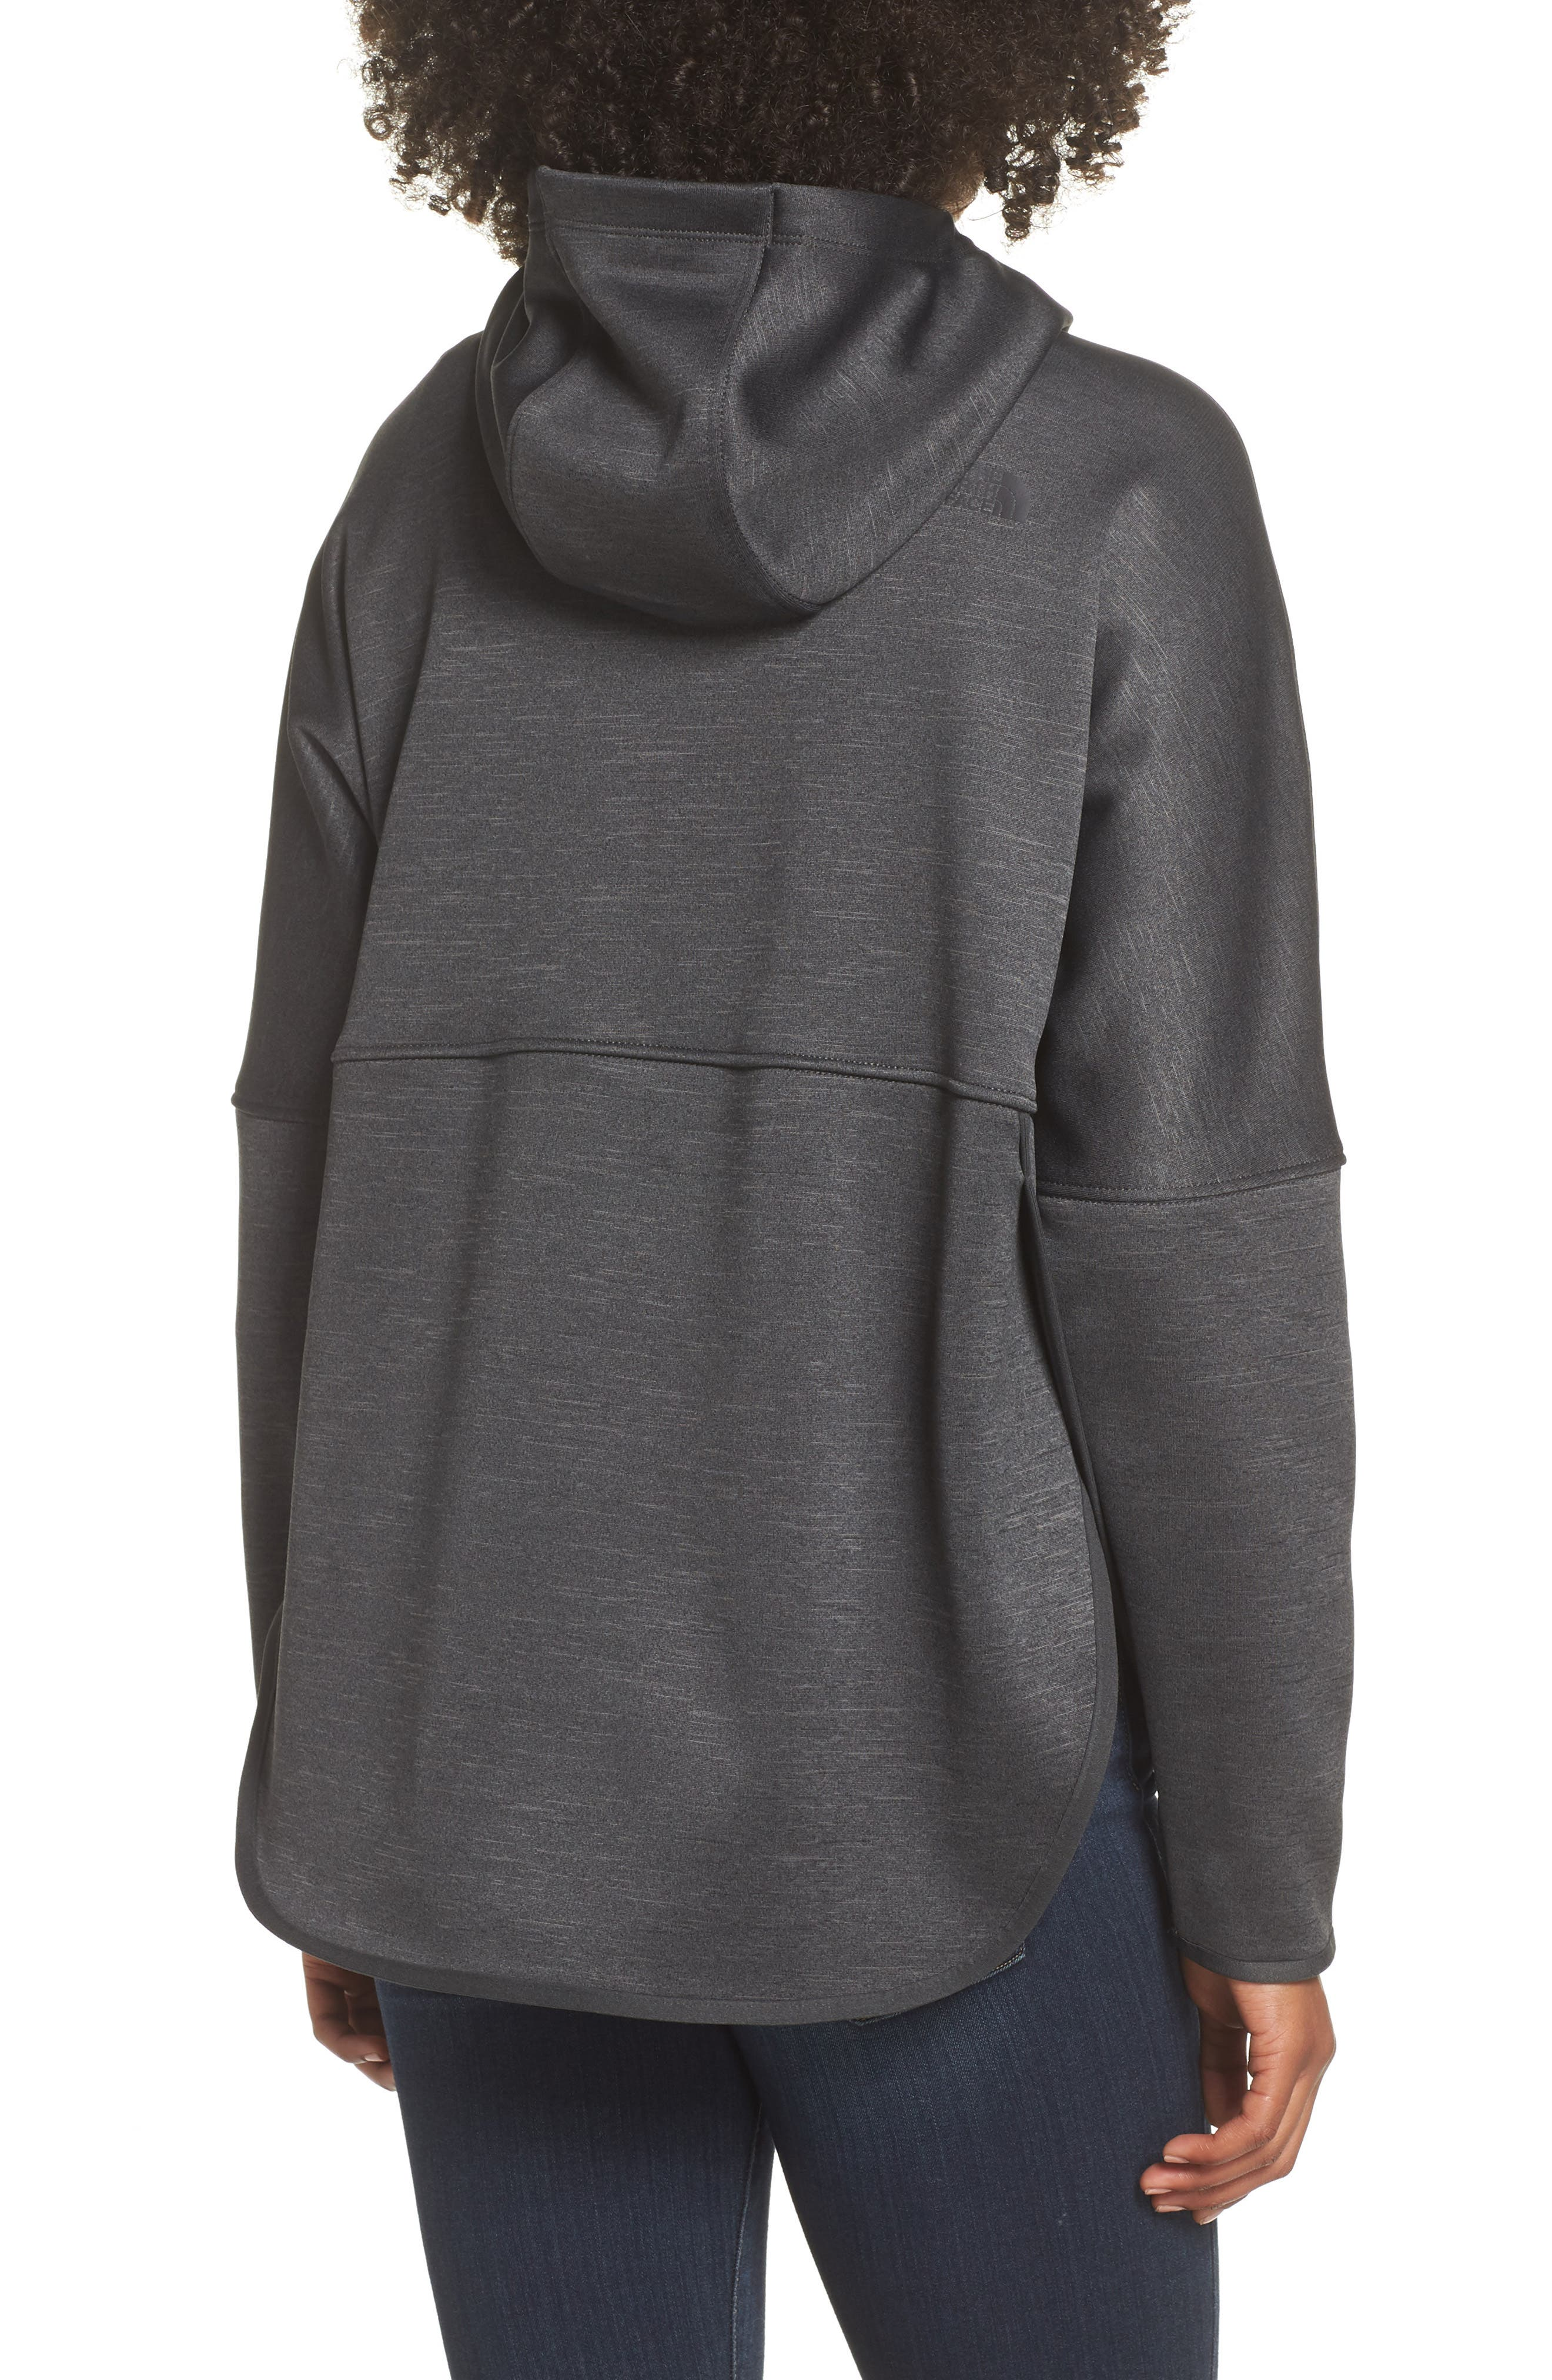 Cozy Slacker Jacket,                             Alternate thumbnail 2, color,                             TNF DARK GREY HEATHER